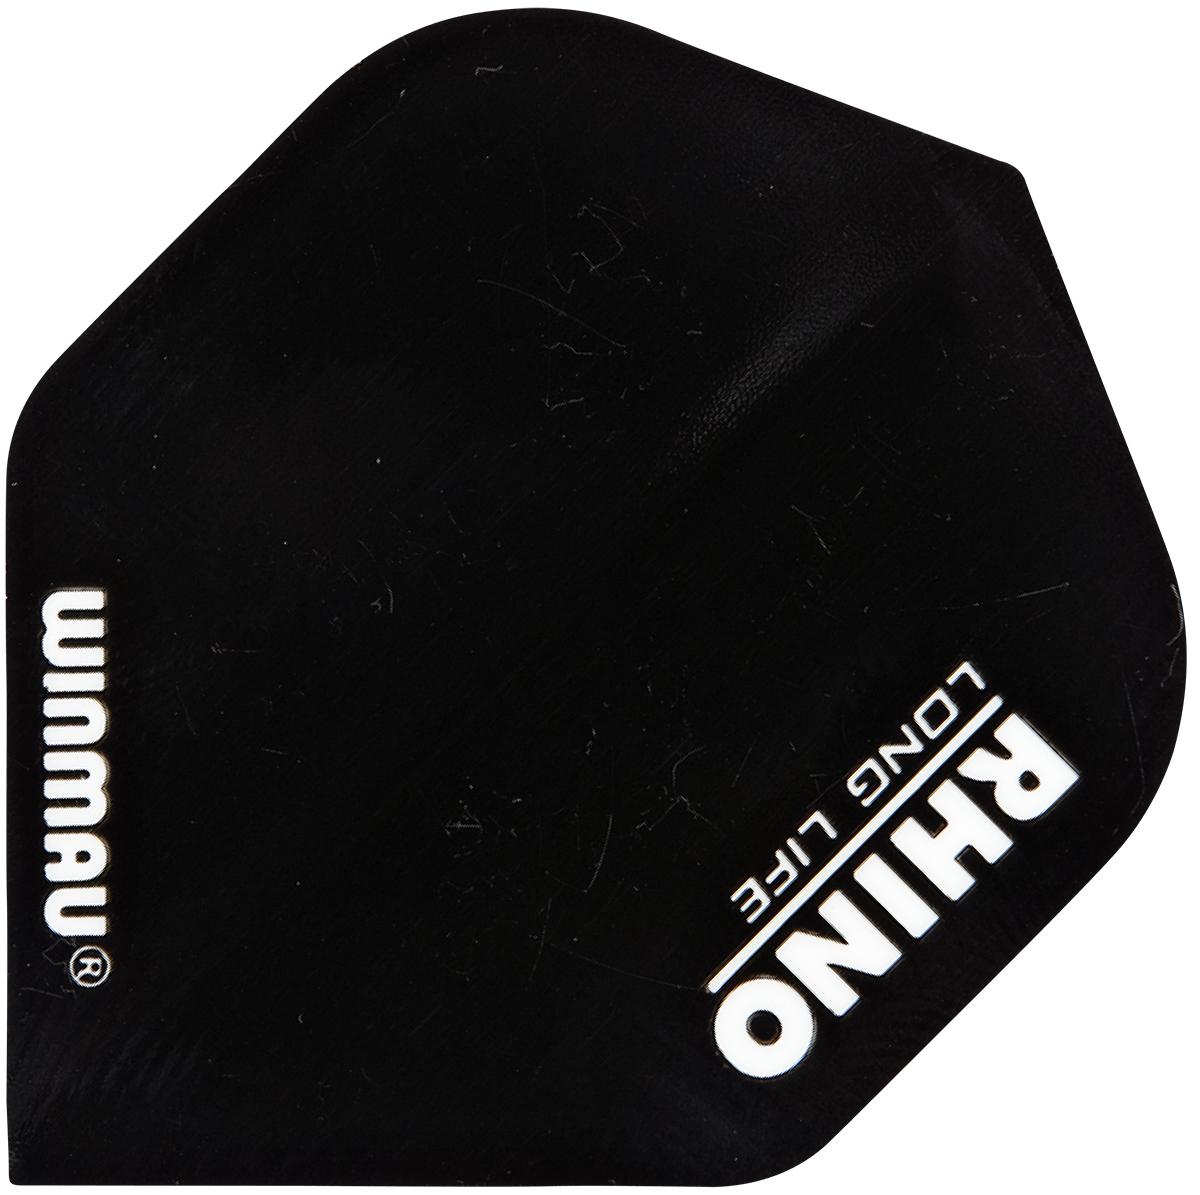 Winmau Rhino Standard Extra Thick Black